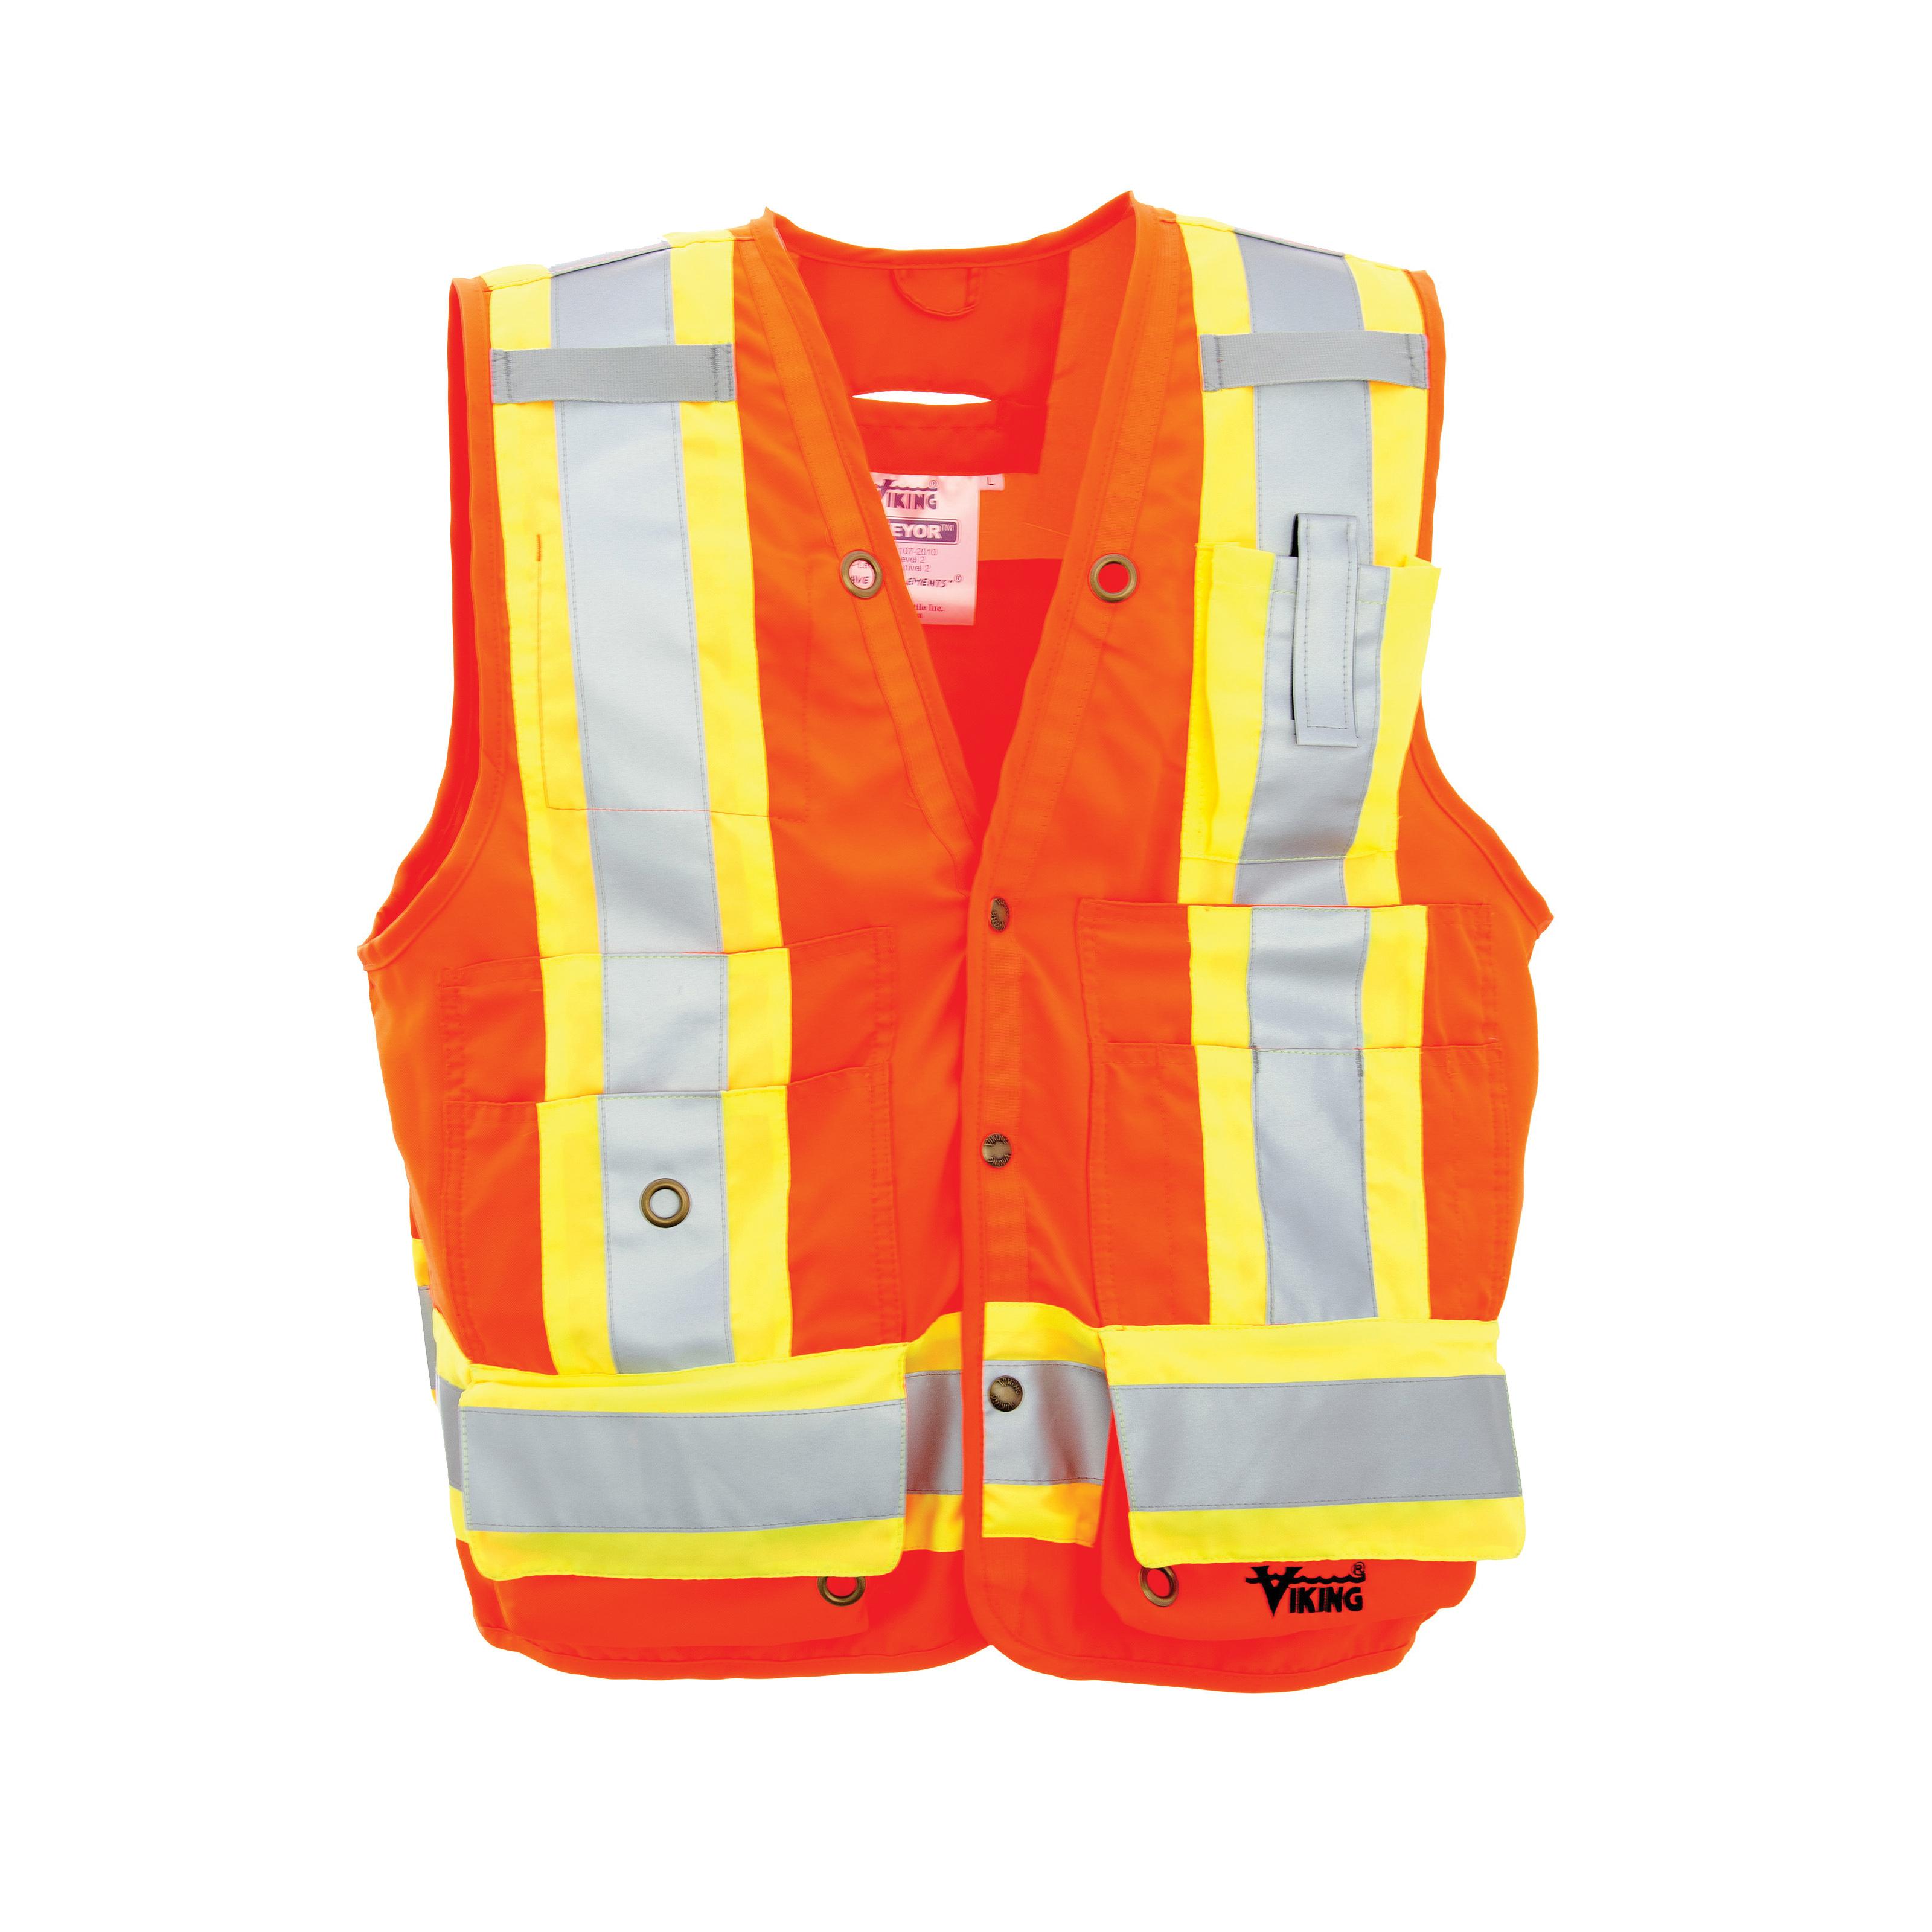 Viking® U6195O-2XL Surveyor Safety Vest, 2XL, Orange, Polyester, Front Snap Closure, 8 Pockets, ANSI Class: Class 2, ANSI/ISEA 107-2015 Type R